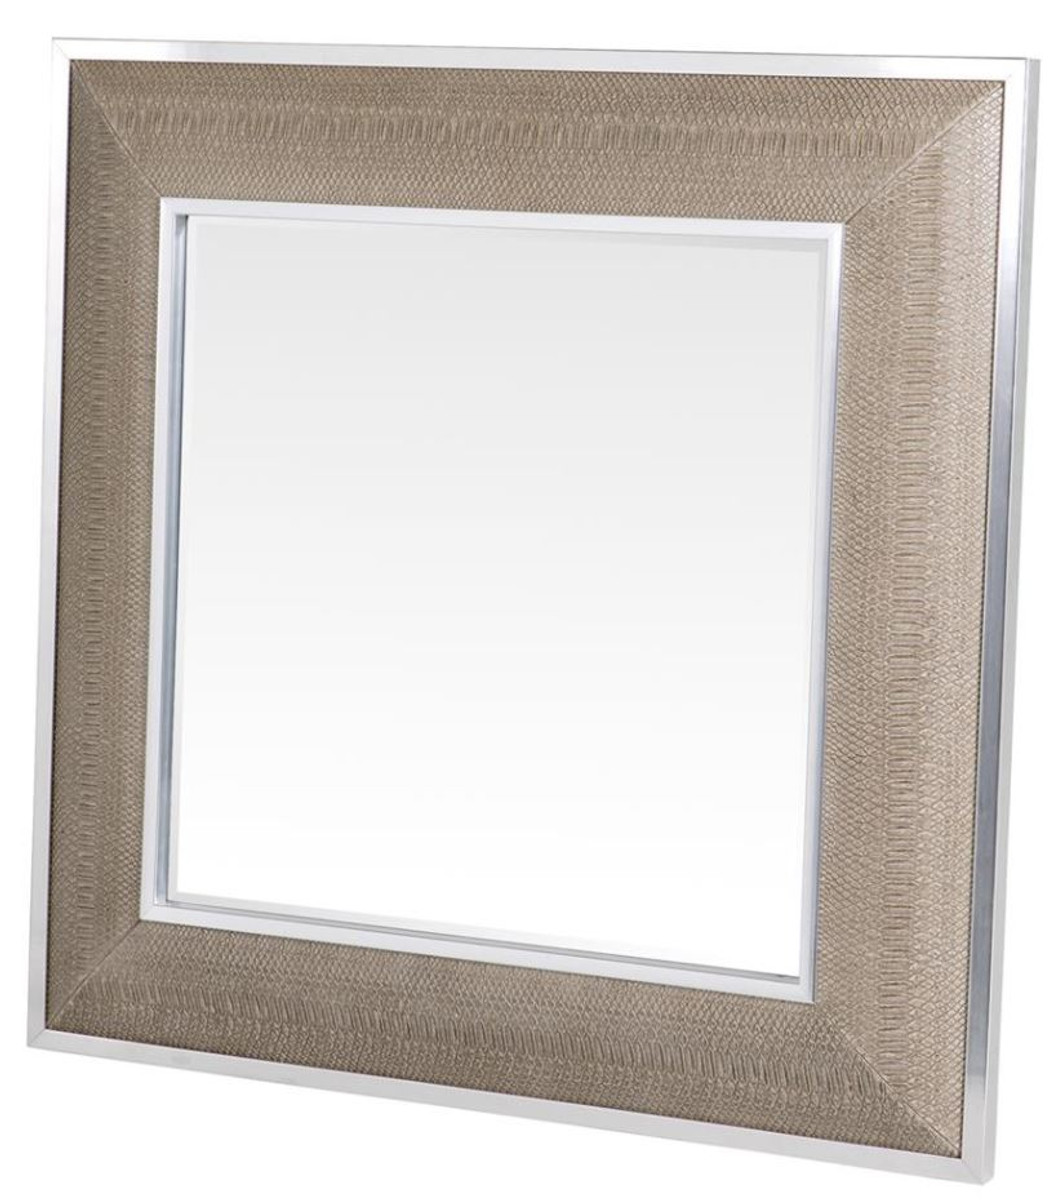 casa padrino designer spiegel mit cremefarbigen cobradruck. Black Bedroom Furniture Sets. Home Design Ideas